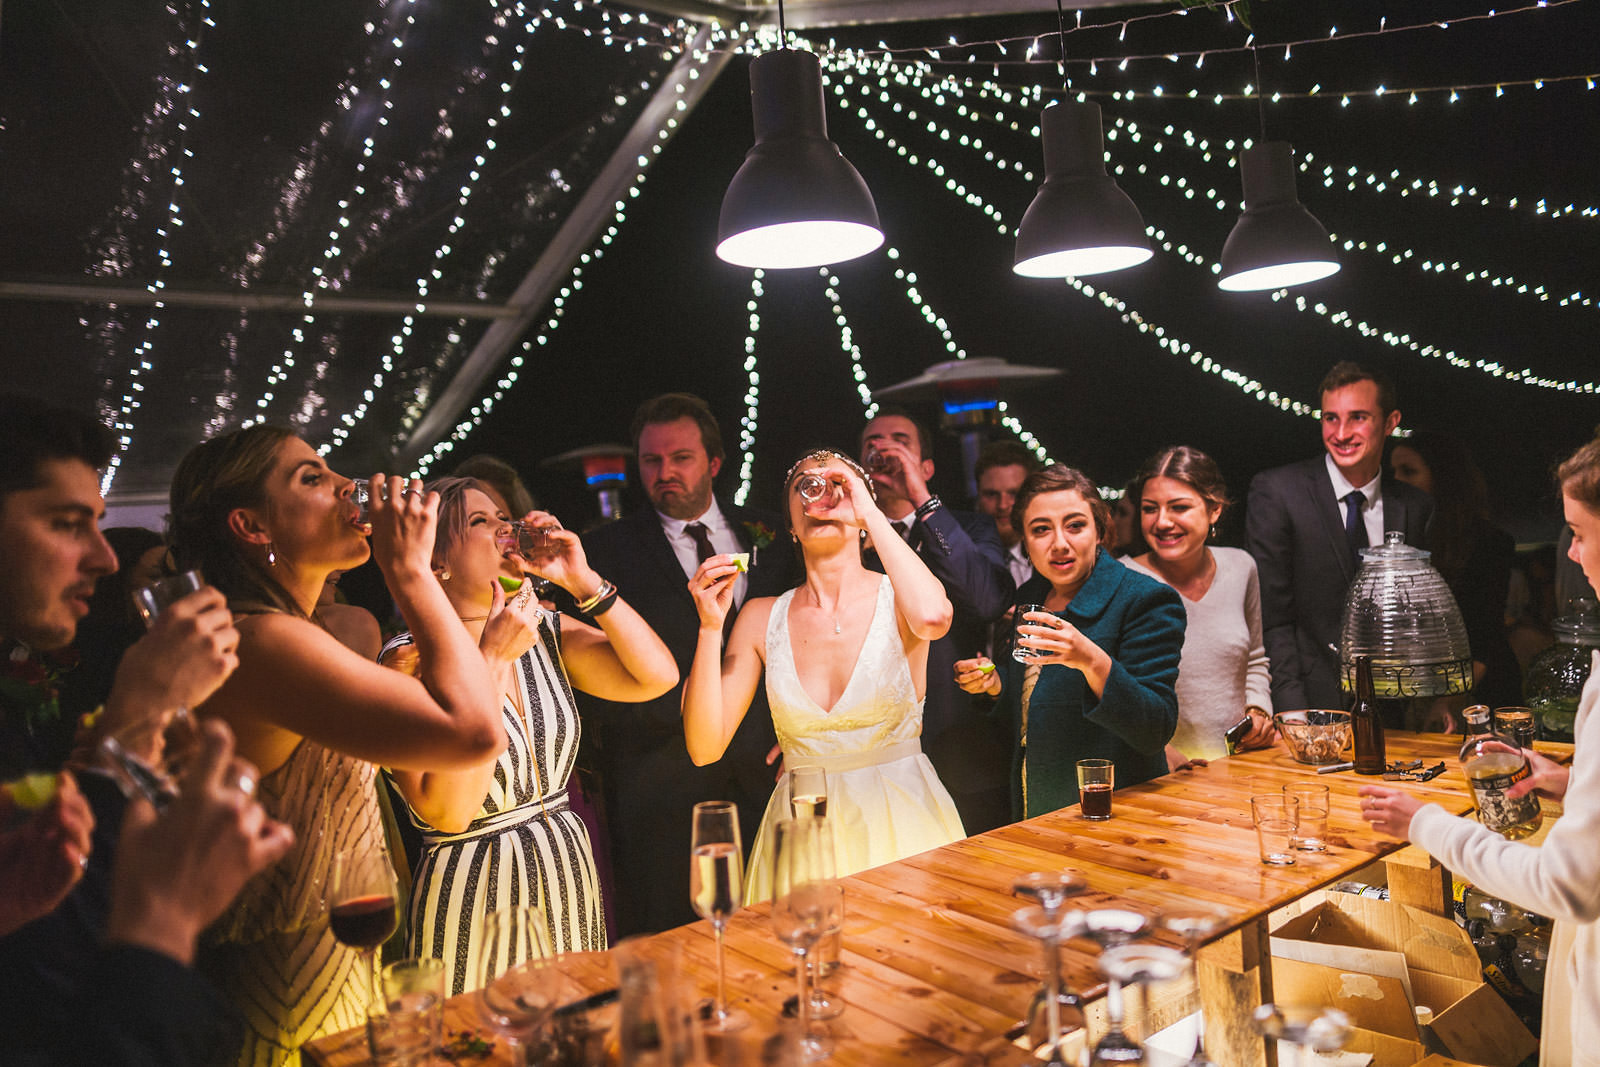 tablelands_wedding_0074